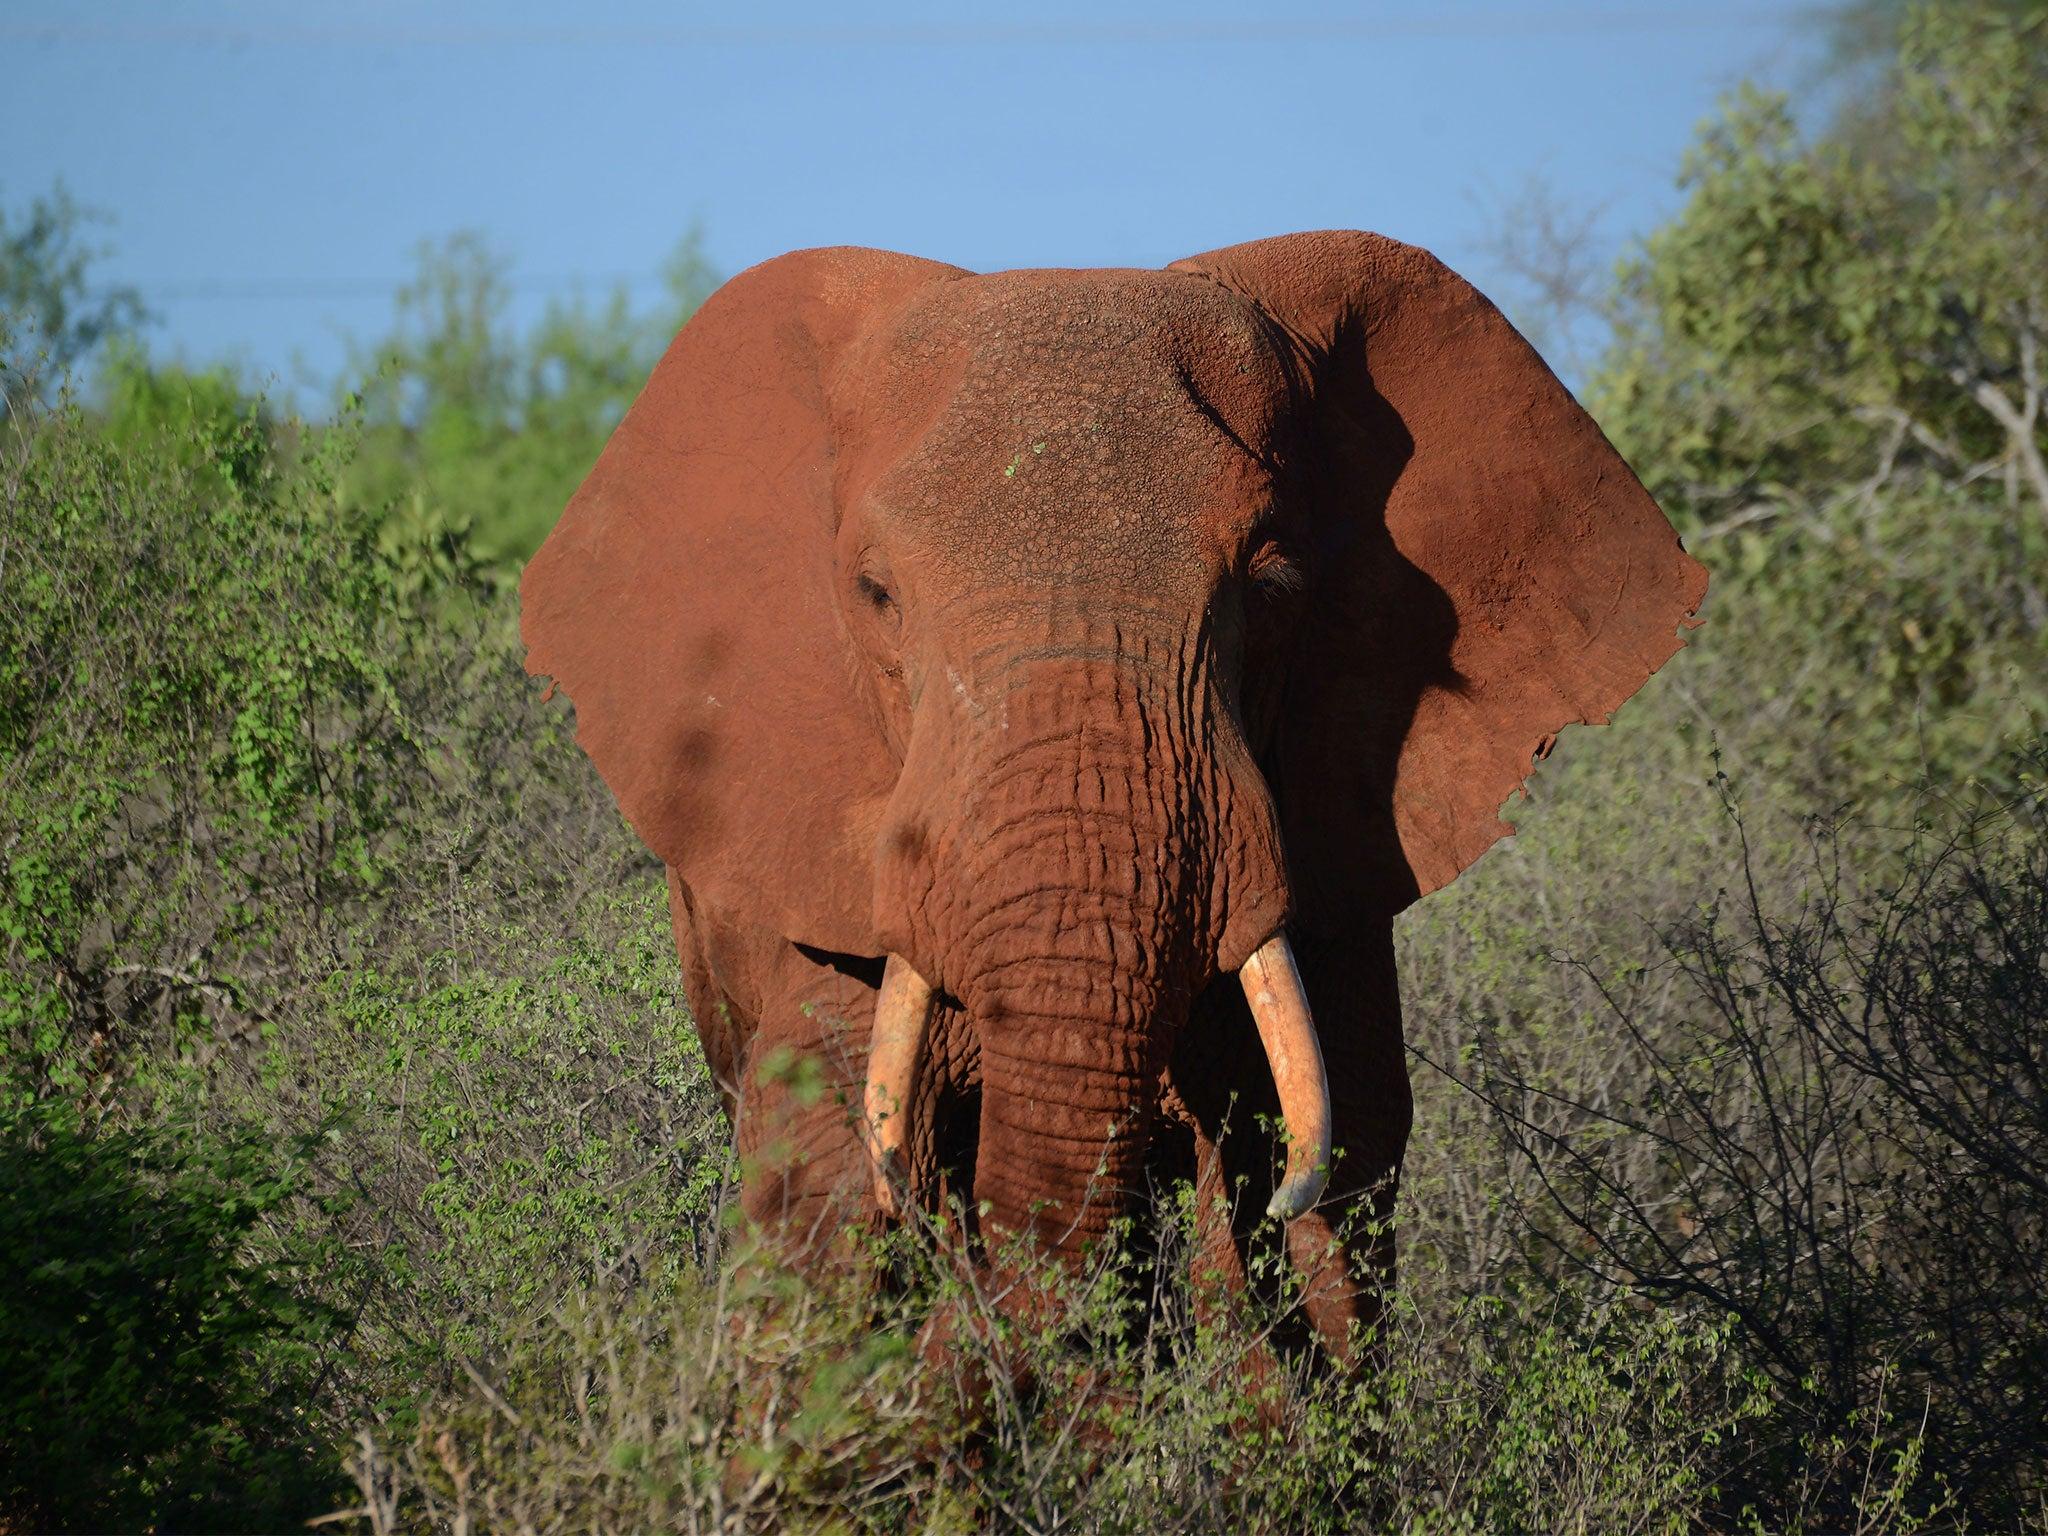 Elephant poachers shot dead by rangers at wildlife reserve in Kenya